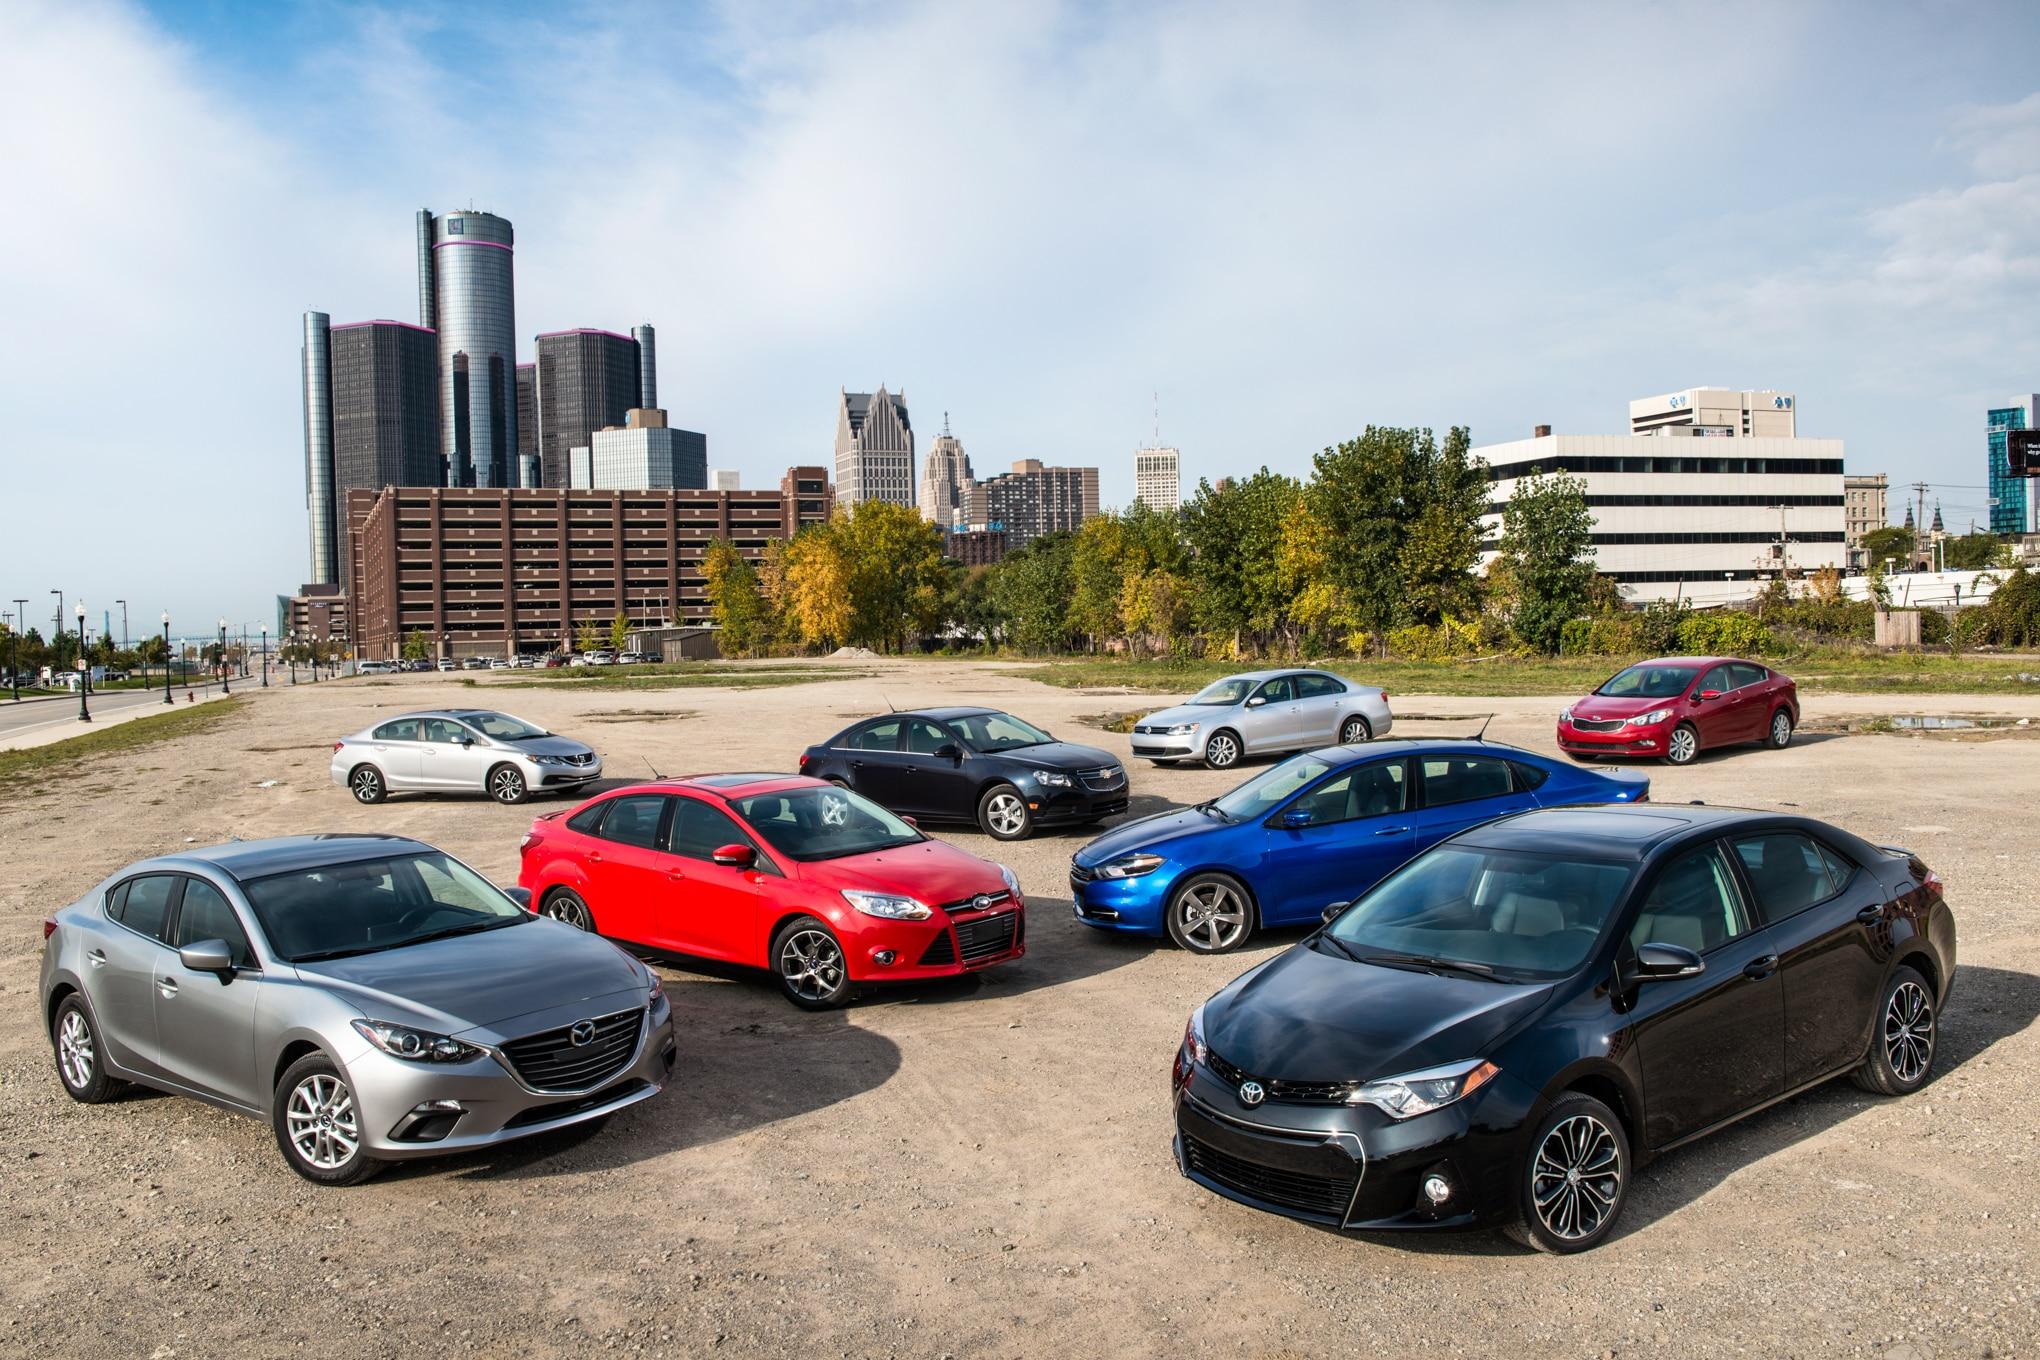 2014 Automobile Magazine Compact Sedan Comparison Day One 8 Car Group Image 1